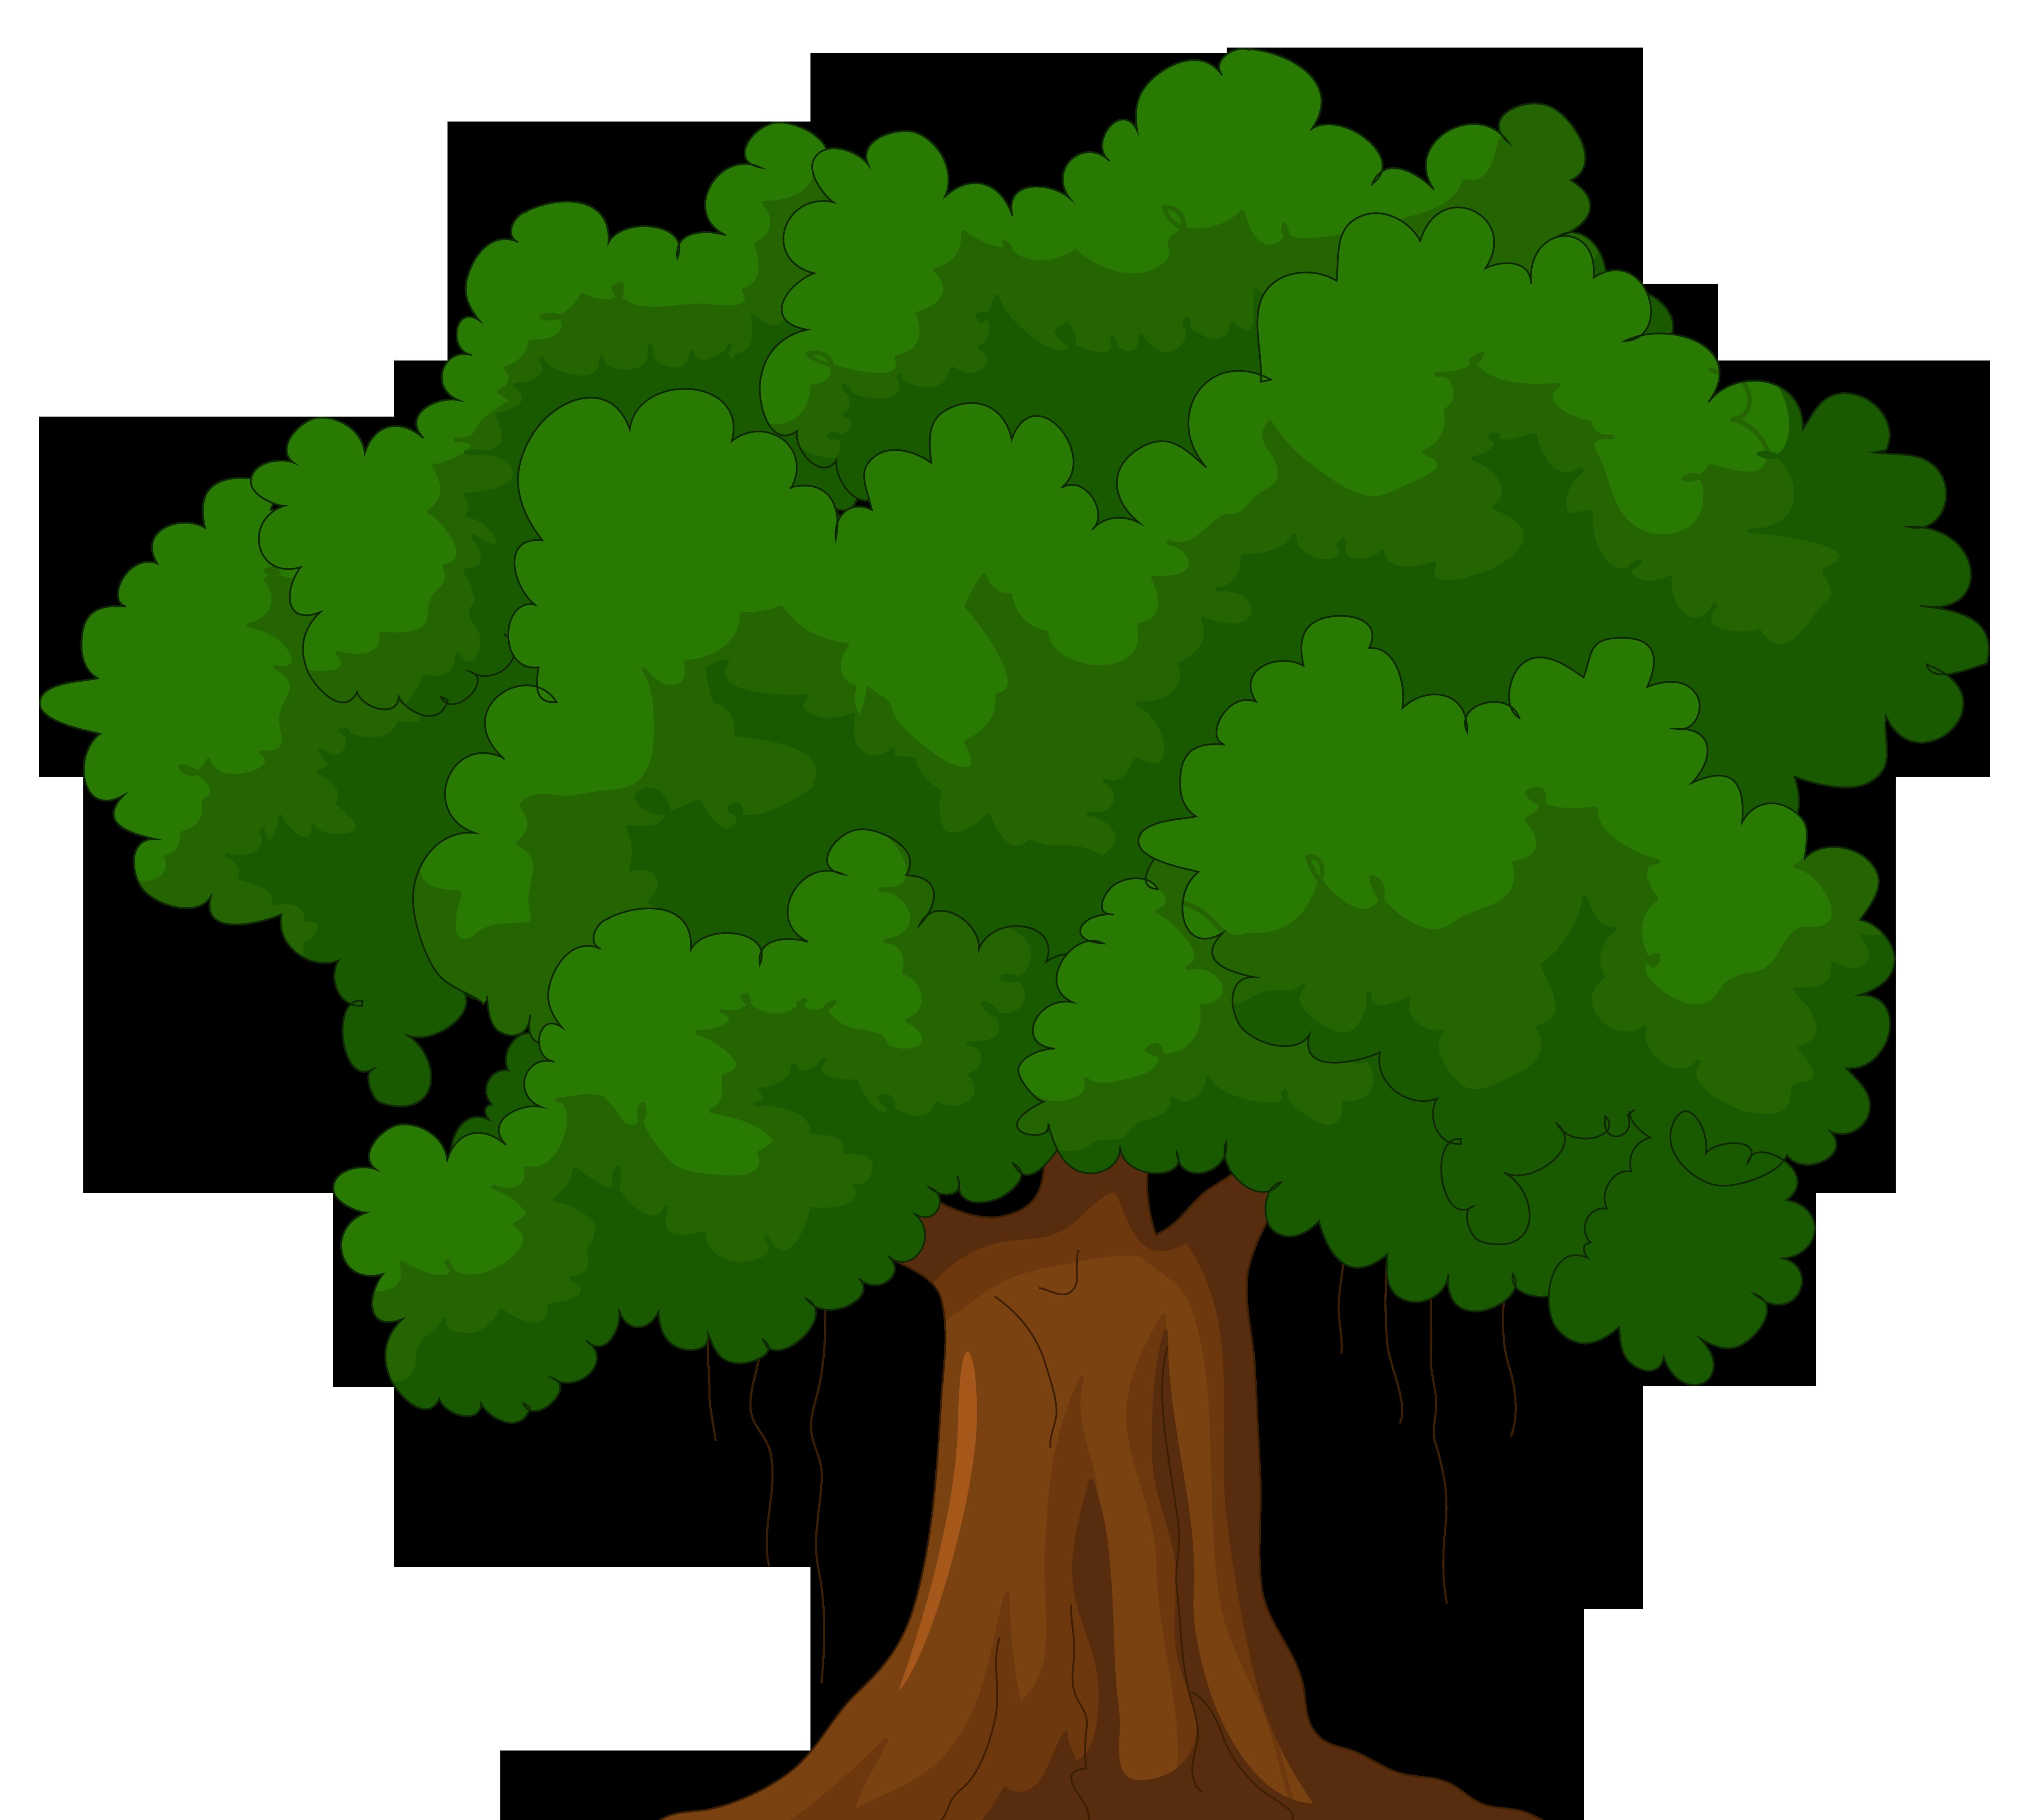 4992x4478 Cartoon Green Tree Png Clipart